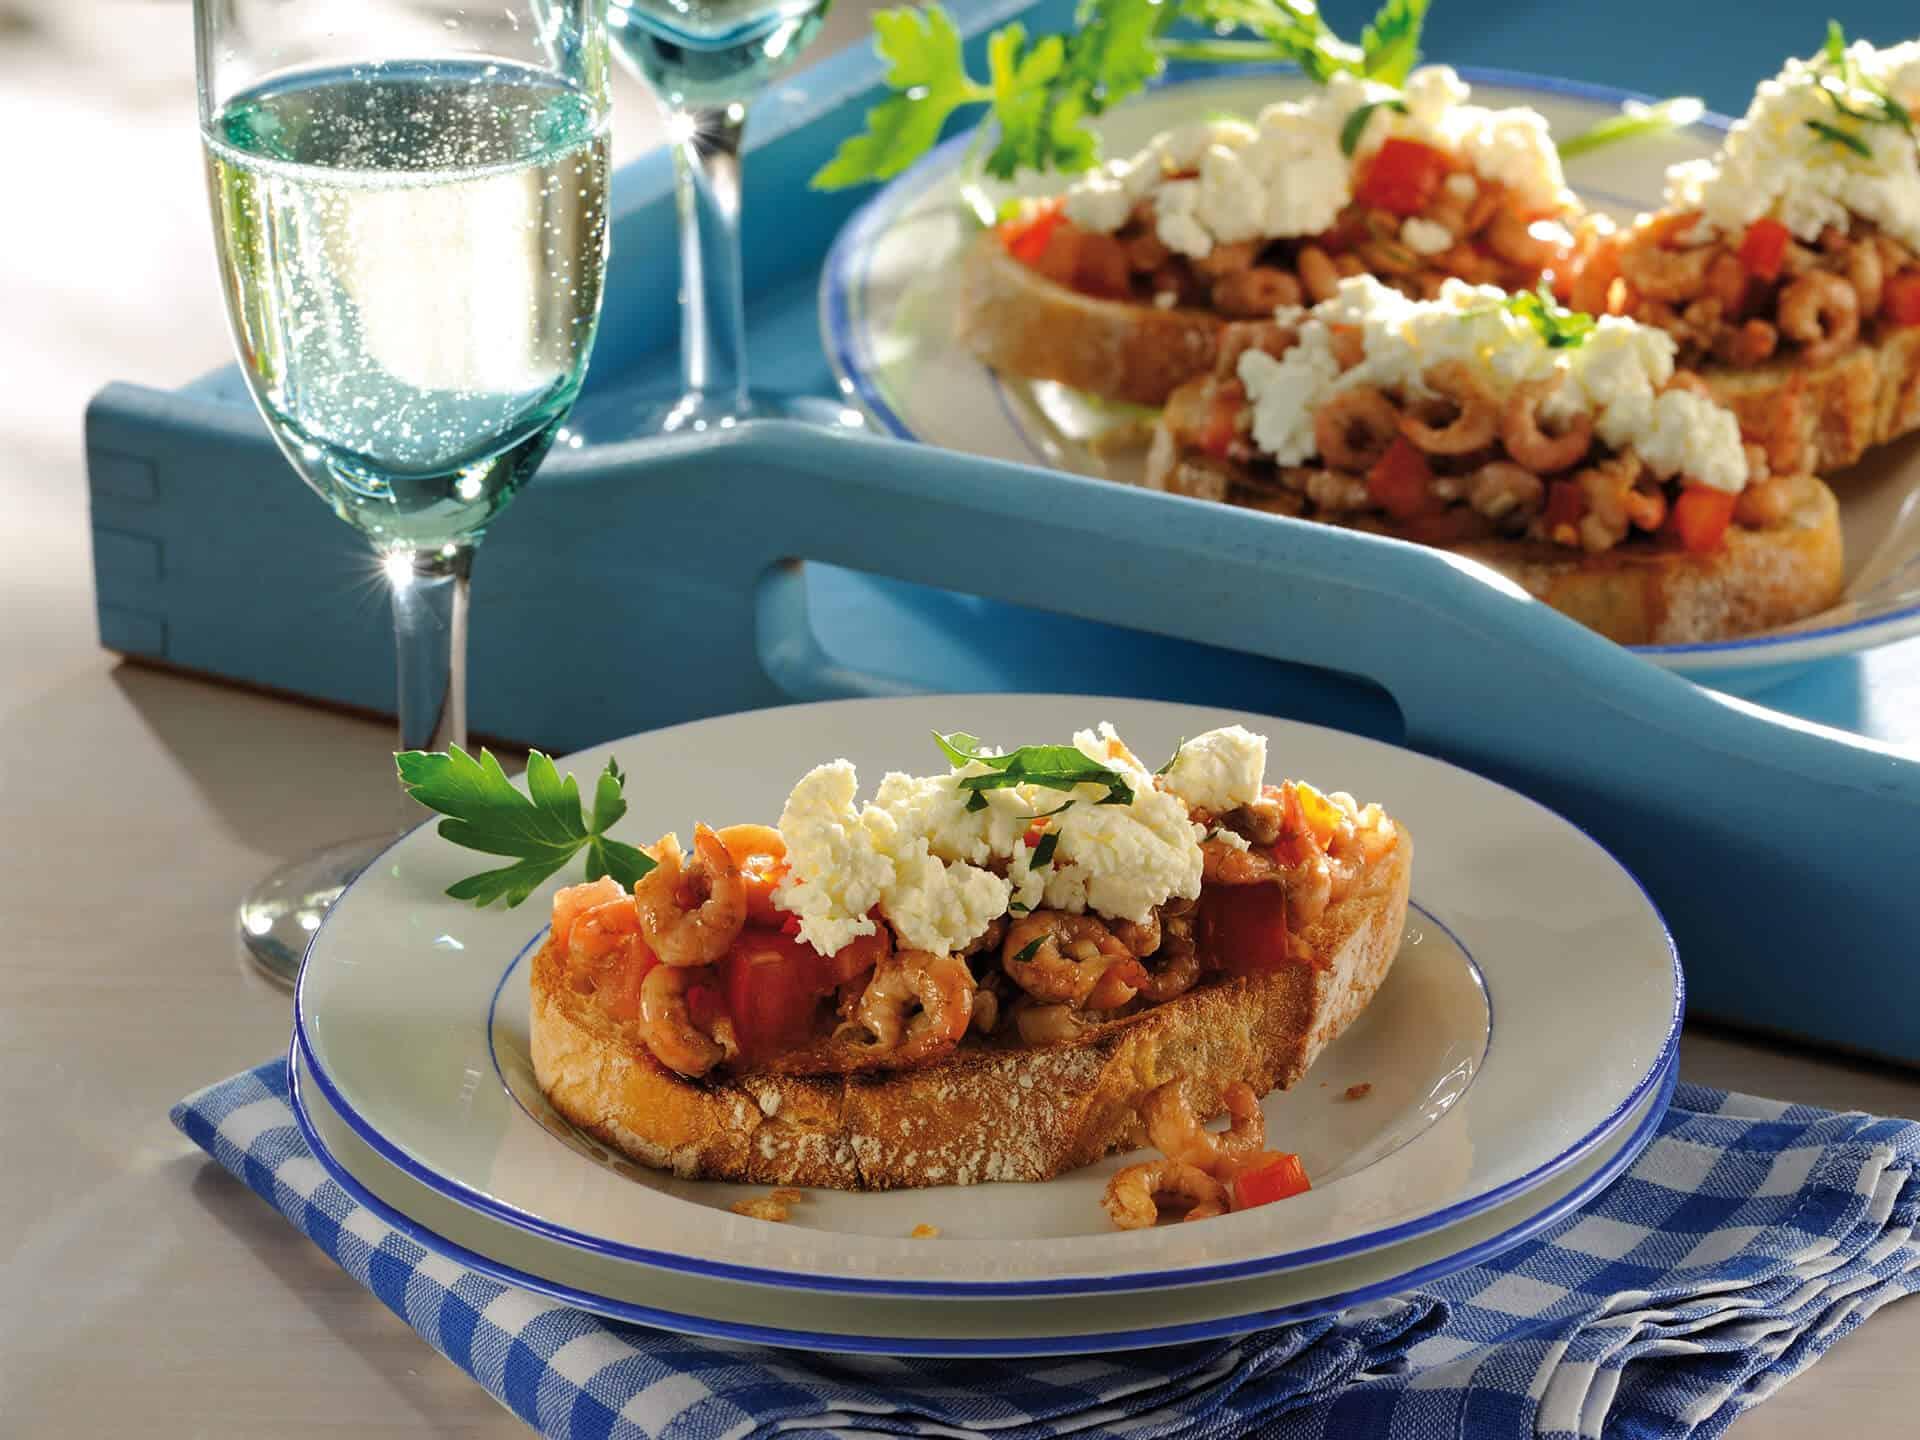 Krabbenbrot mal anders – mit Tomate und Käse